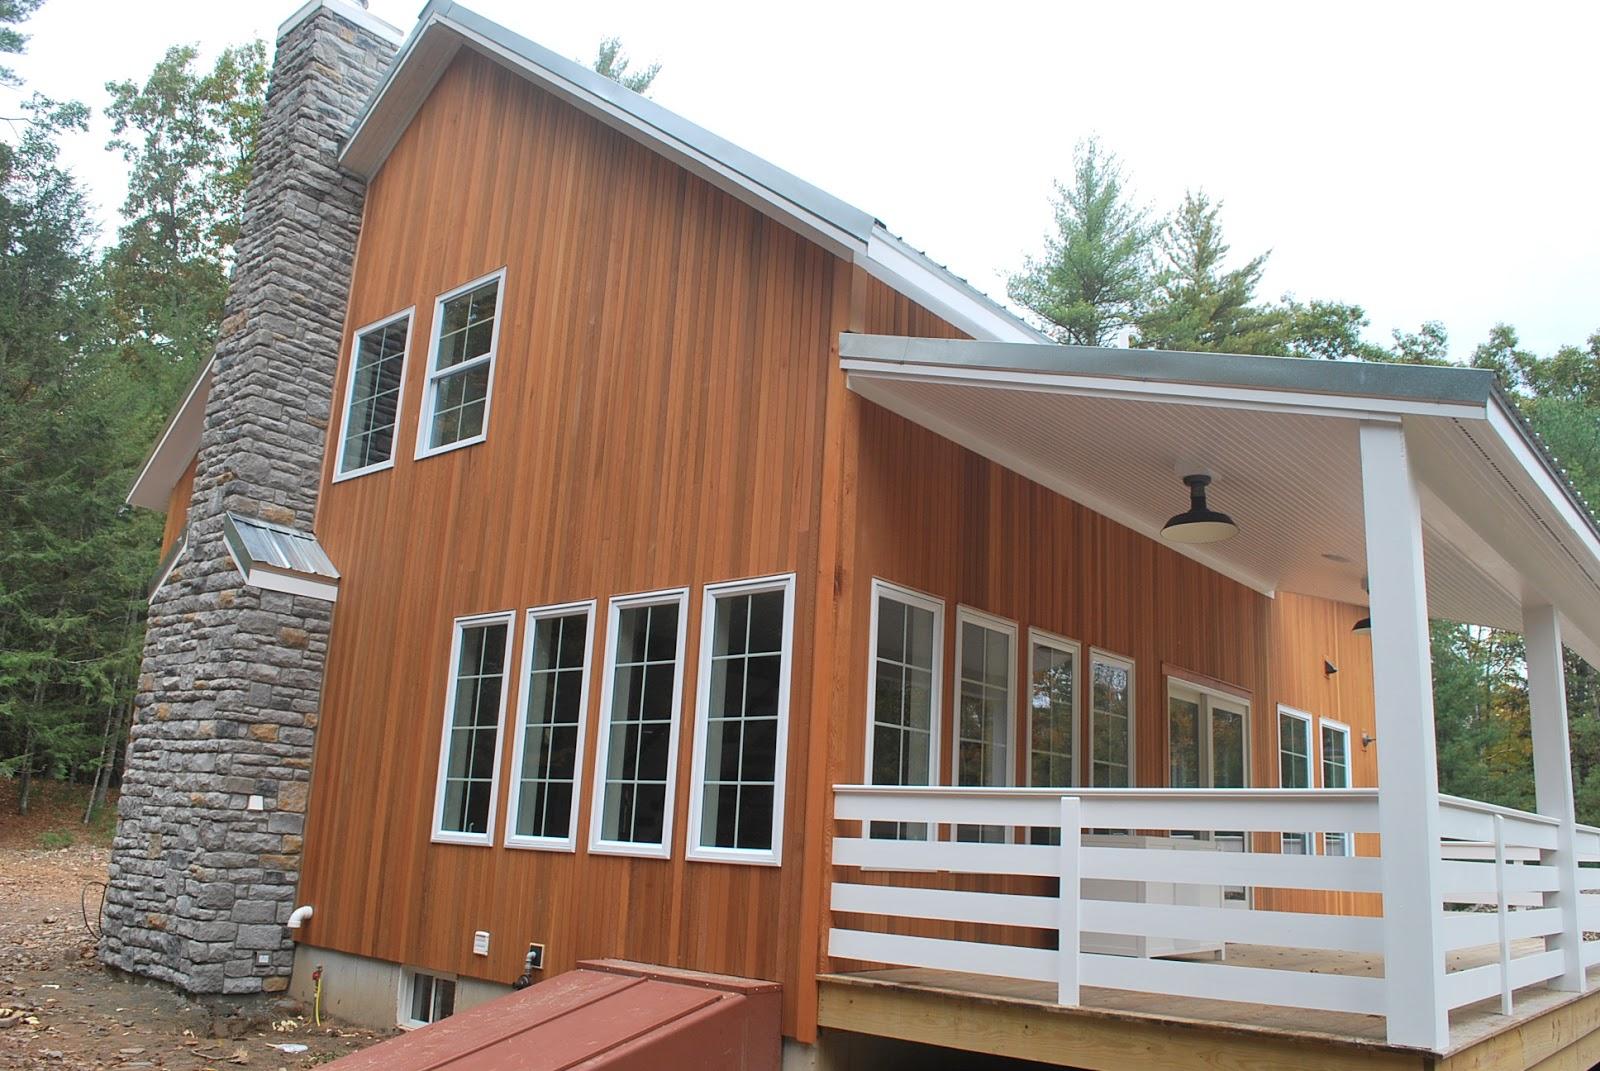 Titan Mobile Home Floor Plans Sullivan County Ulster County Real Estate Catskill